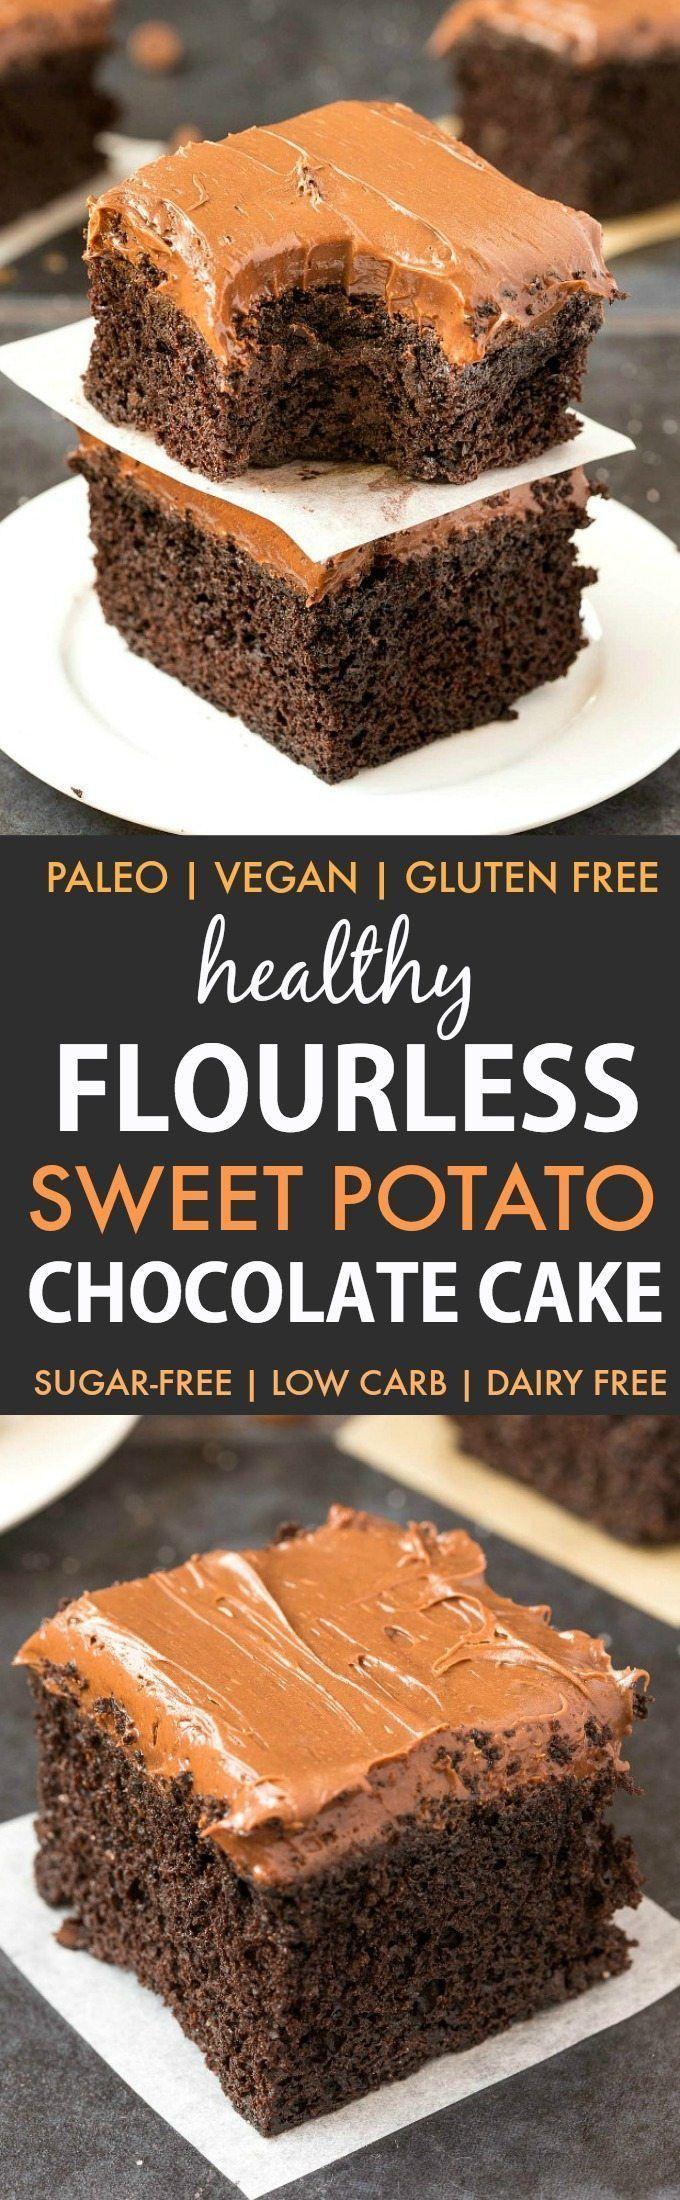 Healthy Flourless Sweet Potato Chocolate Cake (Paleo, Vegan, Gluten Free)- Moist, fudgy and dense, this easy one bowl cake recipe is perfect to enjoy dessert guilt-free with a hidden veggie! Sugar-free and dairy-free. | #healthy #healthycake #sugarfreerecipe #lowcarbrecipe #flourlesscake | Recipe on thebigmansworld.com